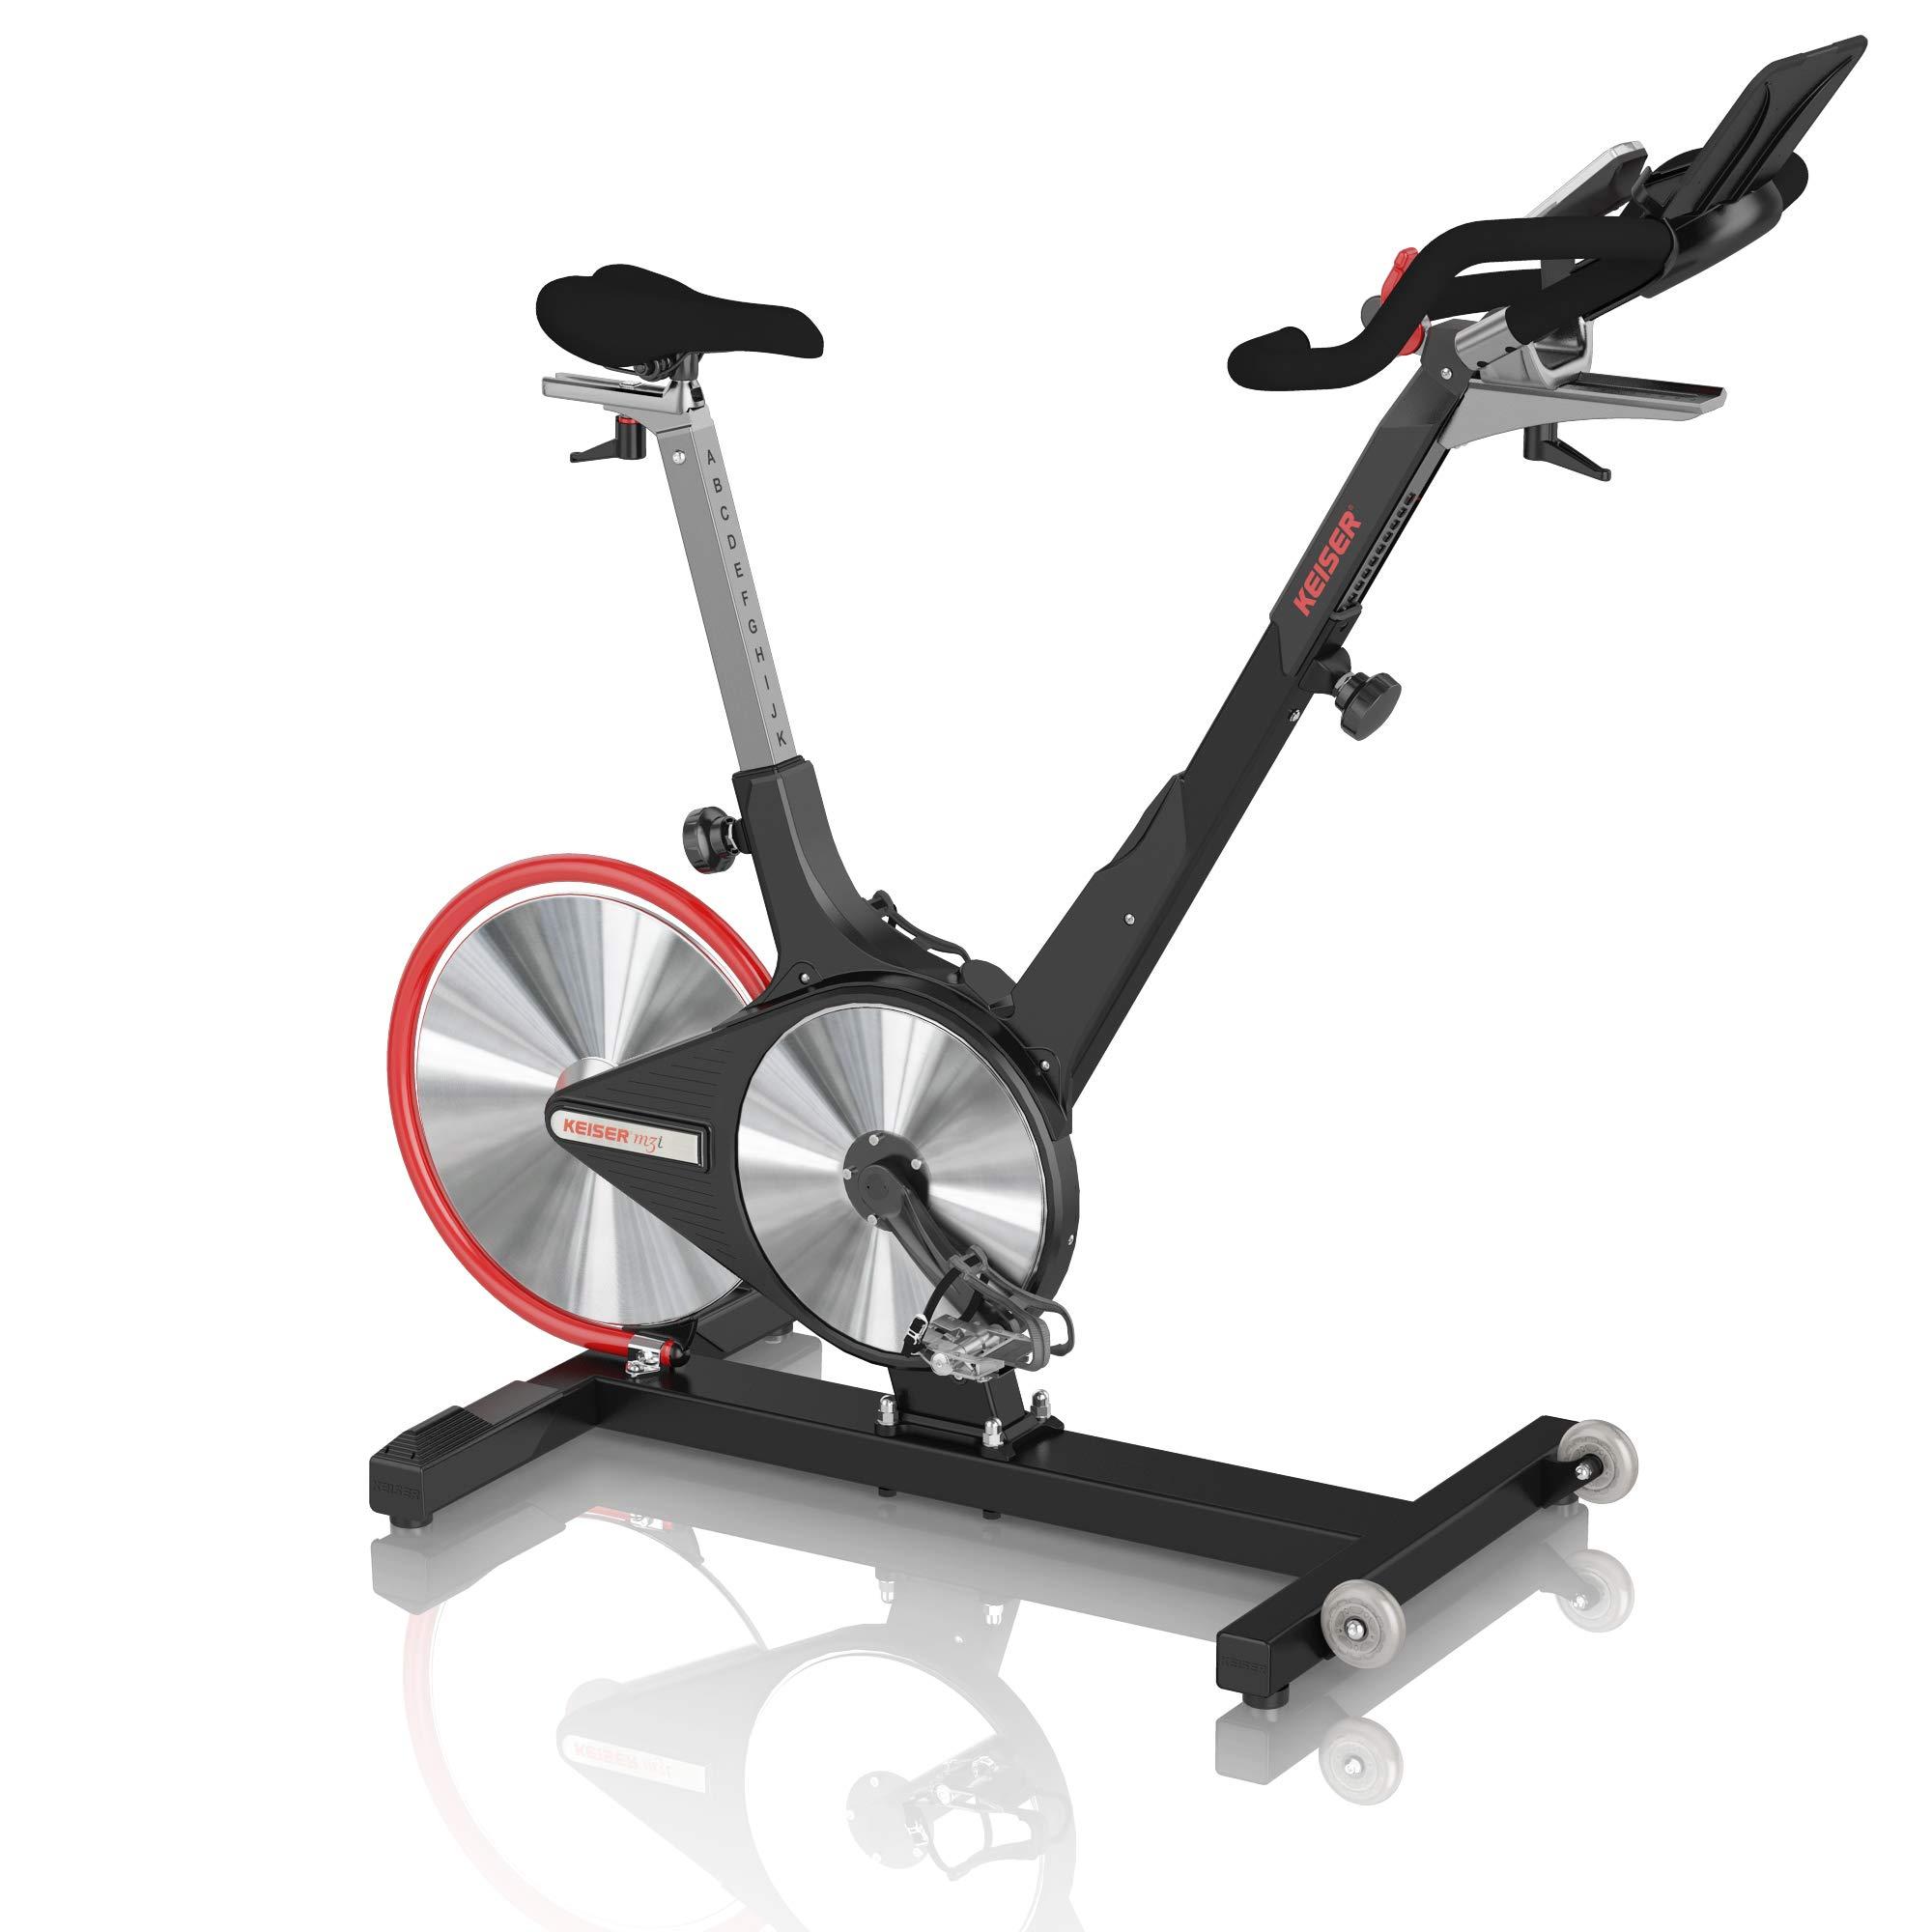 Bicicleta spinning endurance life precio